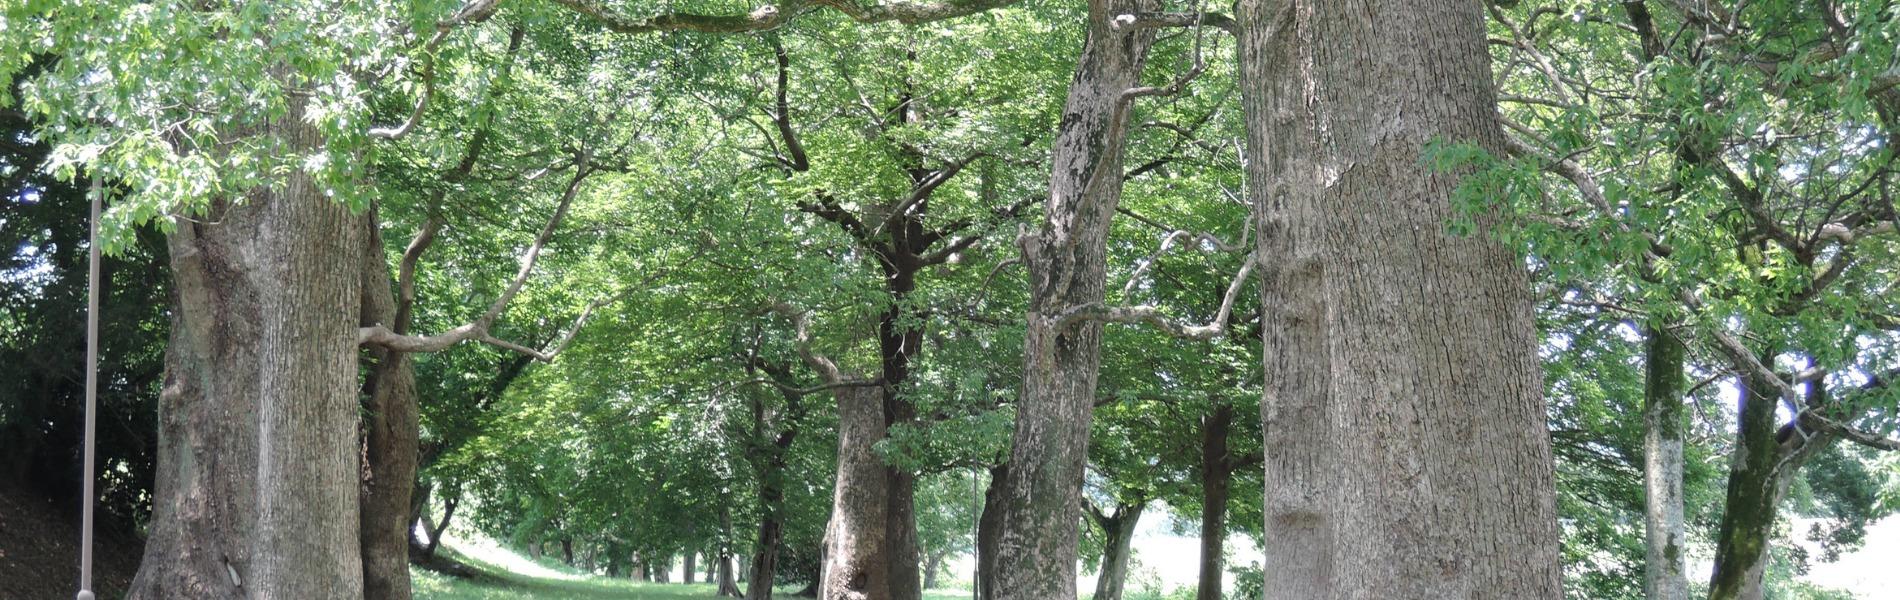 千間土居の楠木